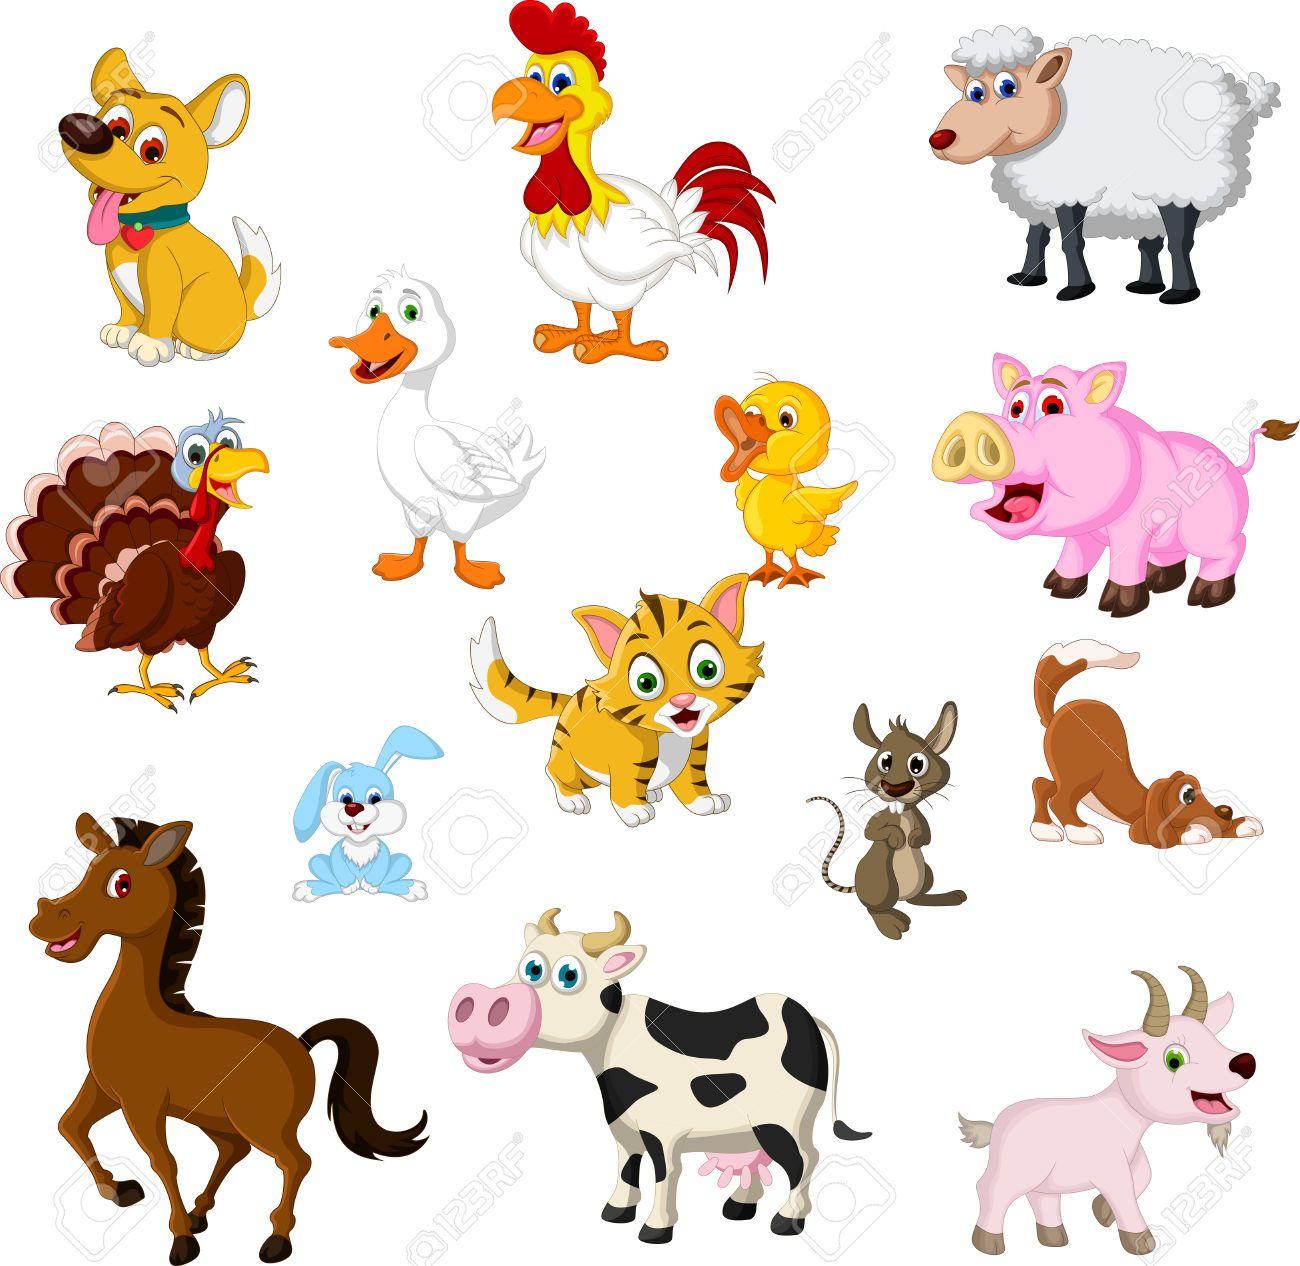 Stock Vector Farm animals preschool, Cartoon cow, Animal